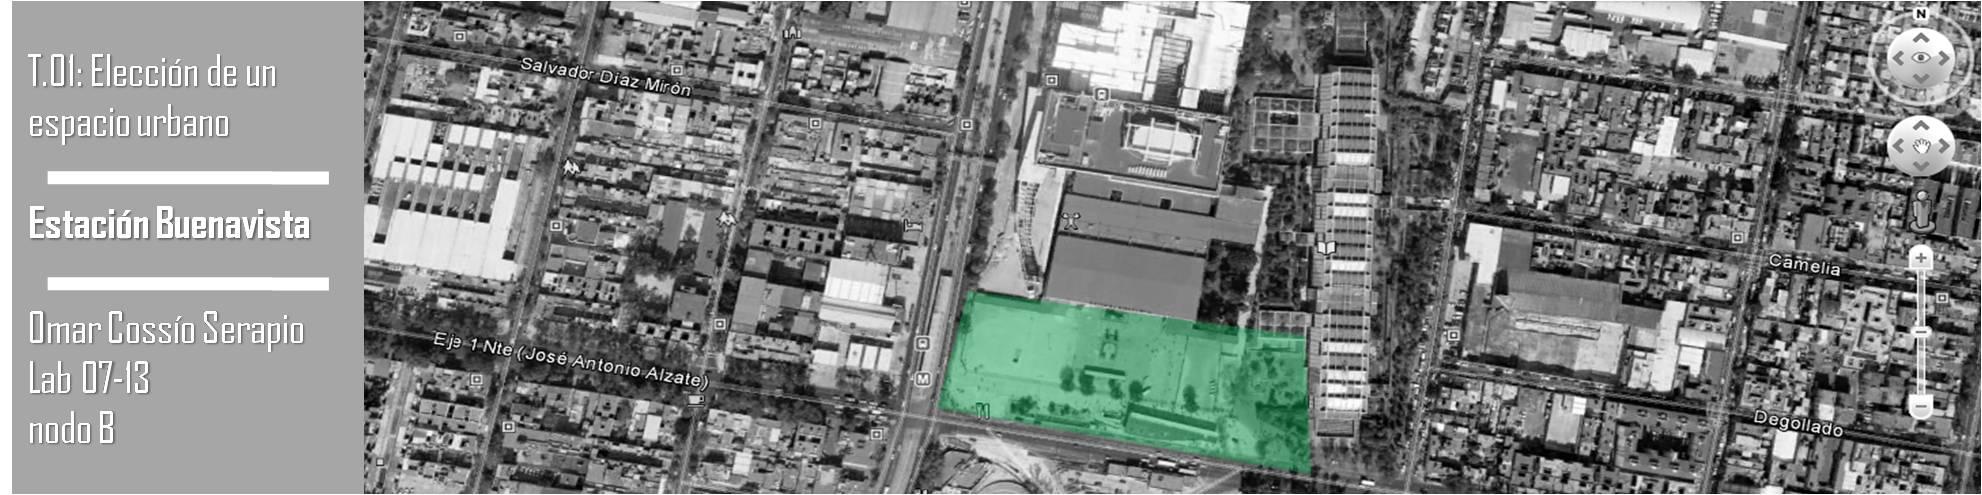 Imagen satelital Buenavista